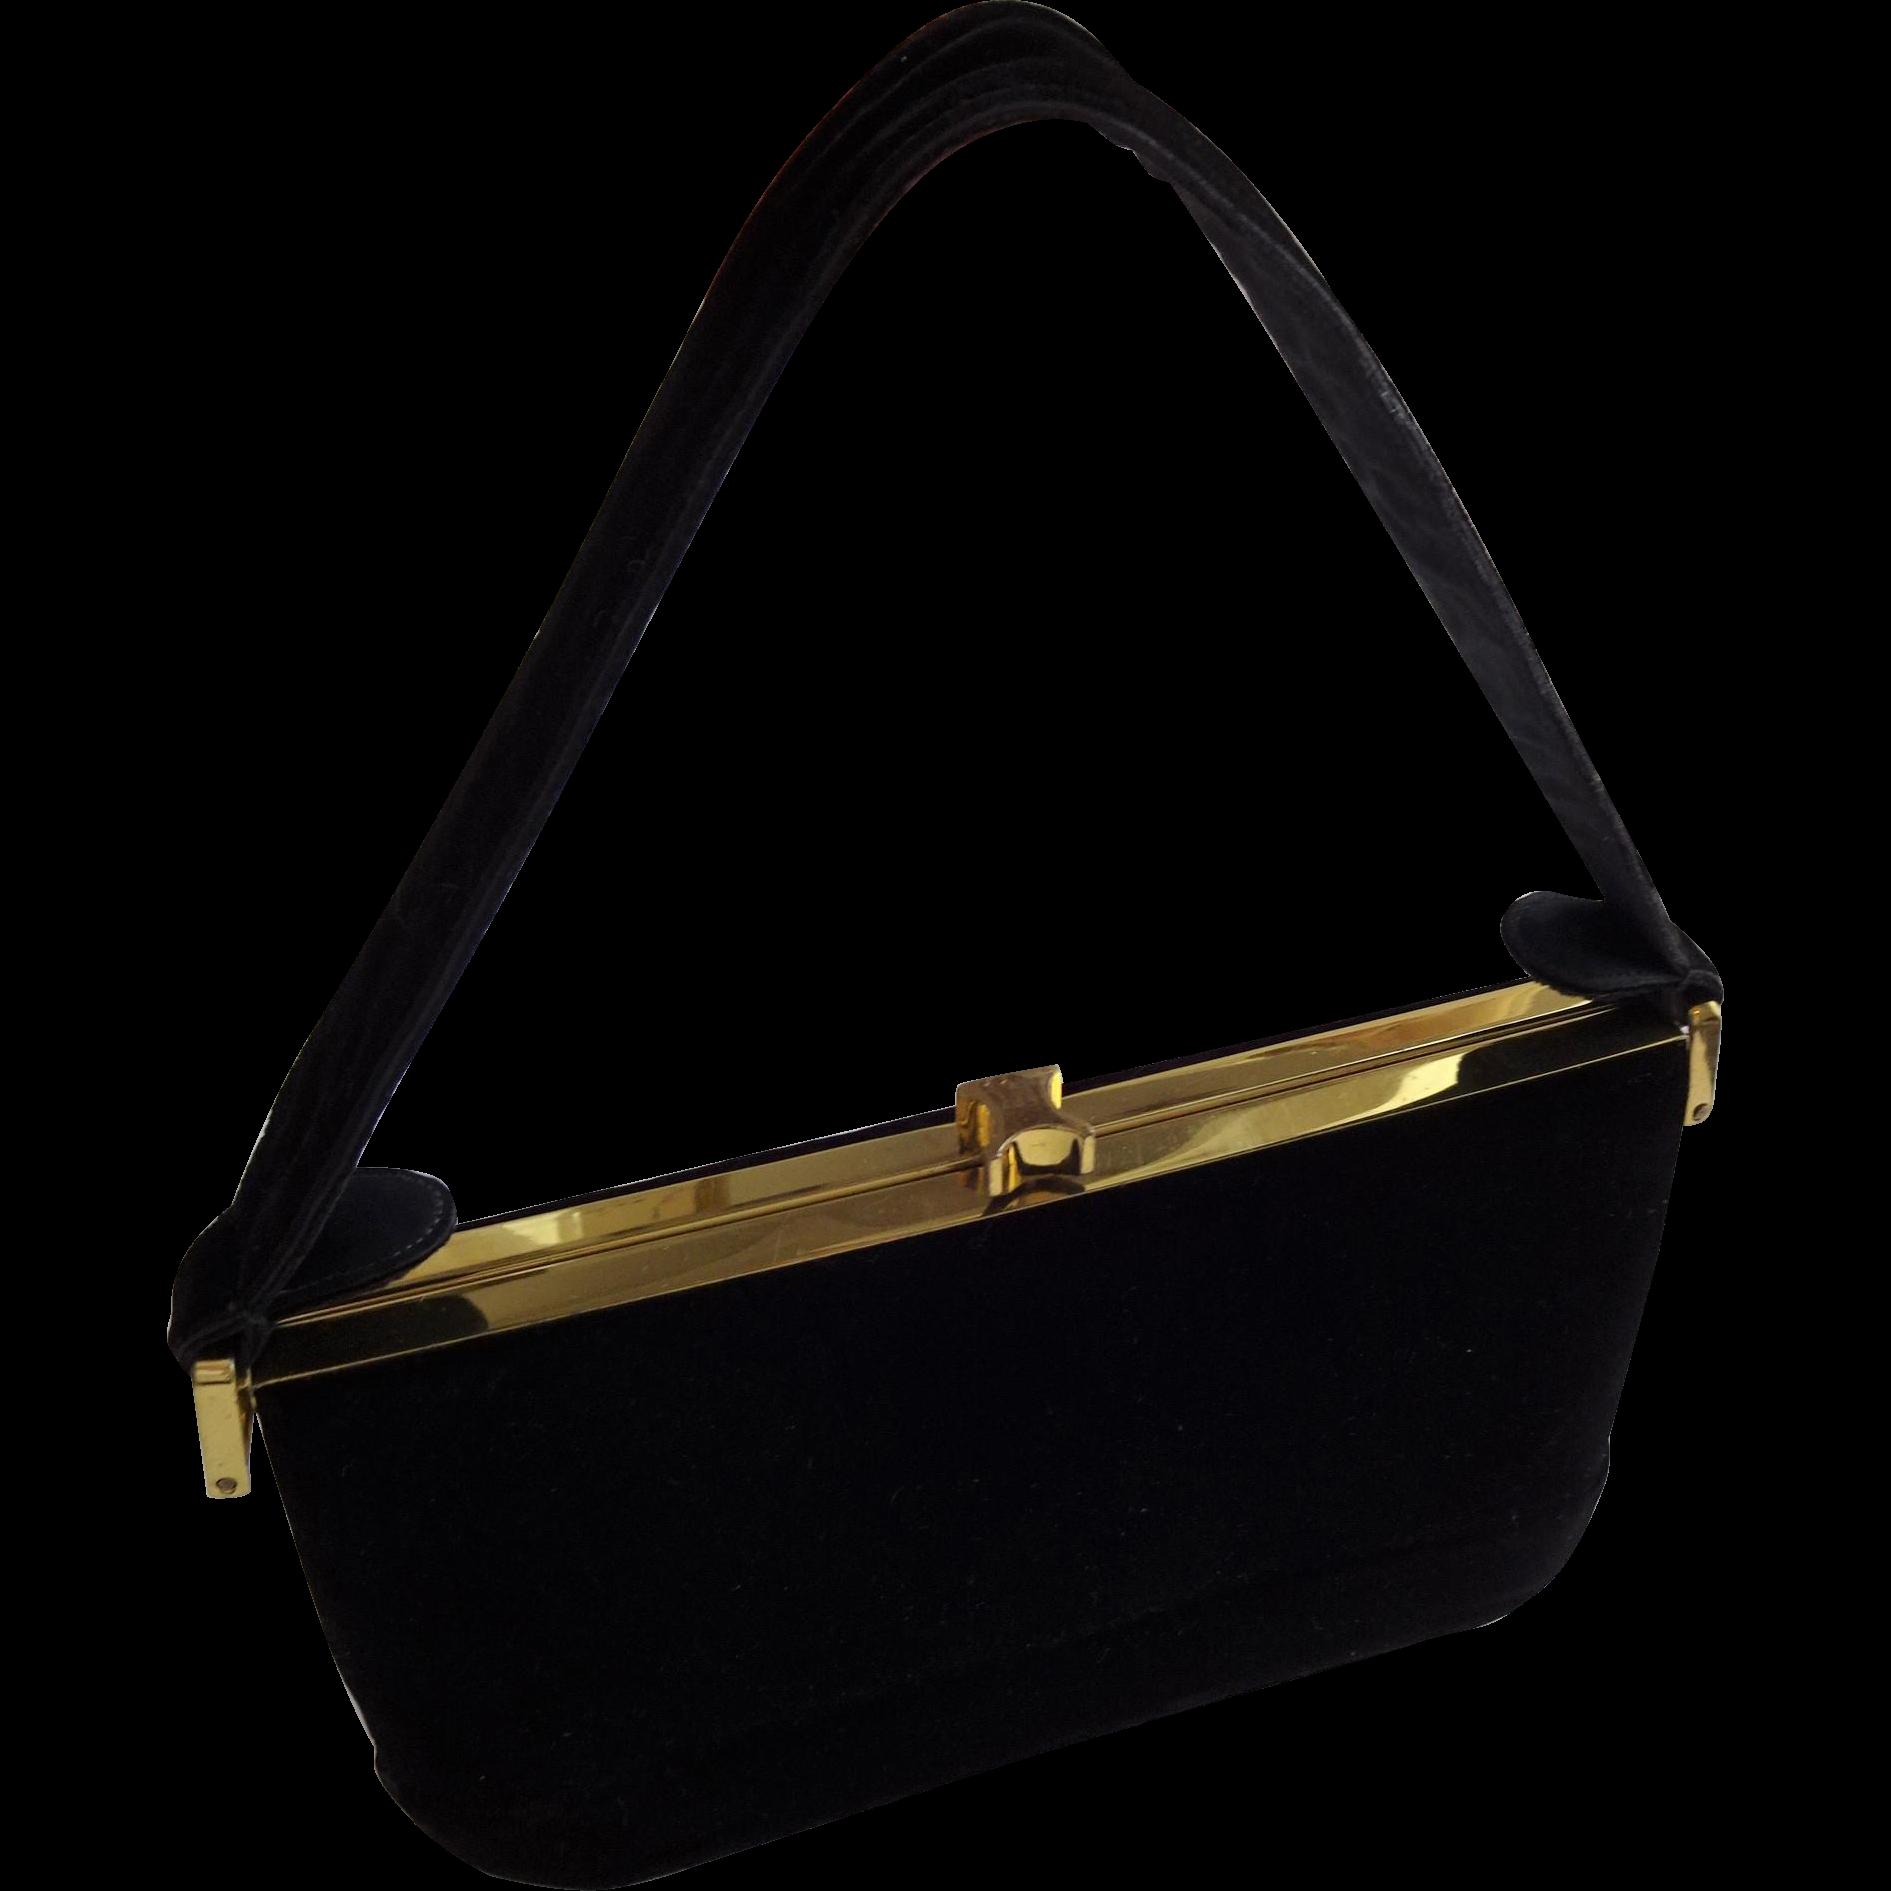 Vintage Black Box Purse Handbag Ingber 1950s Black Velvet Top ...